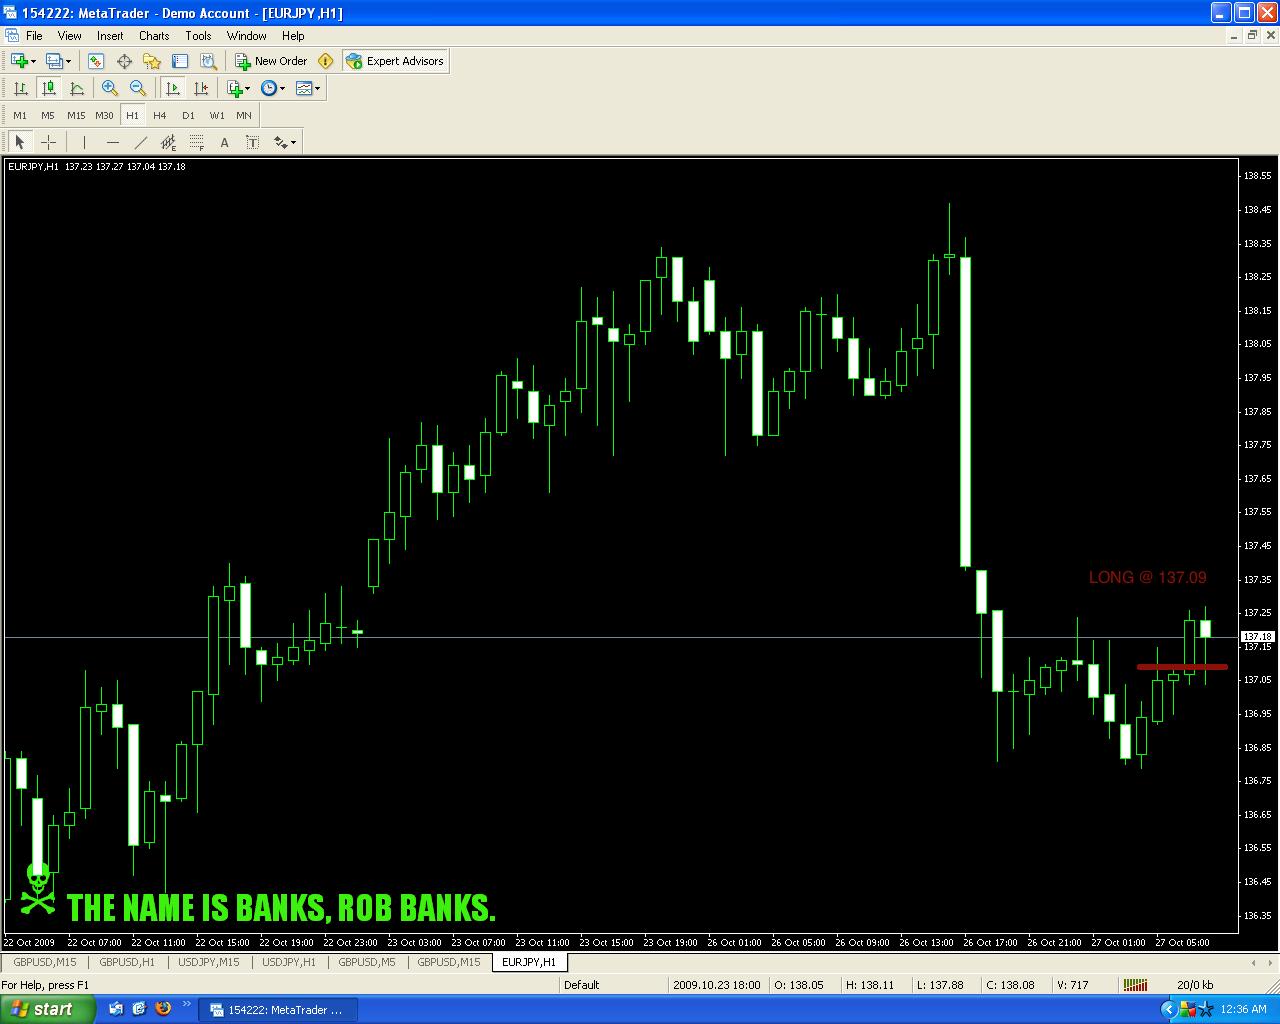 Adaseb S Zeroline Trading Daily Log